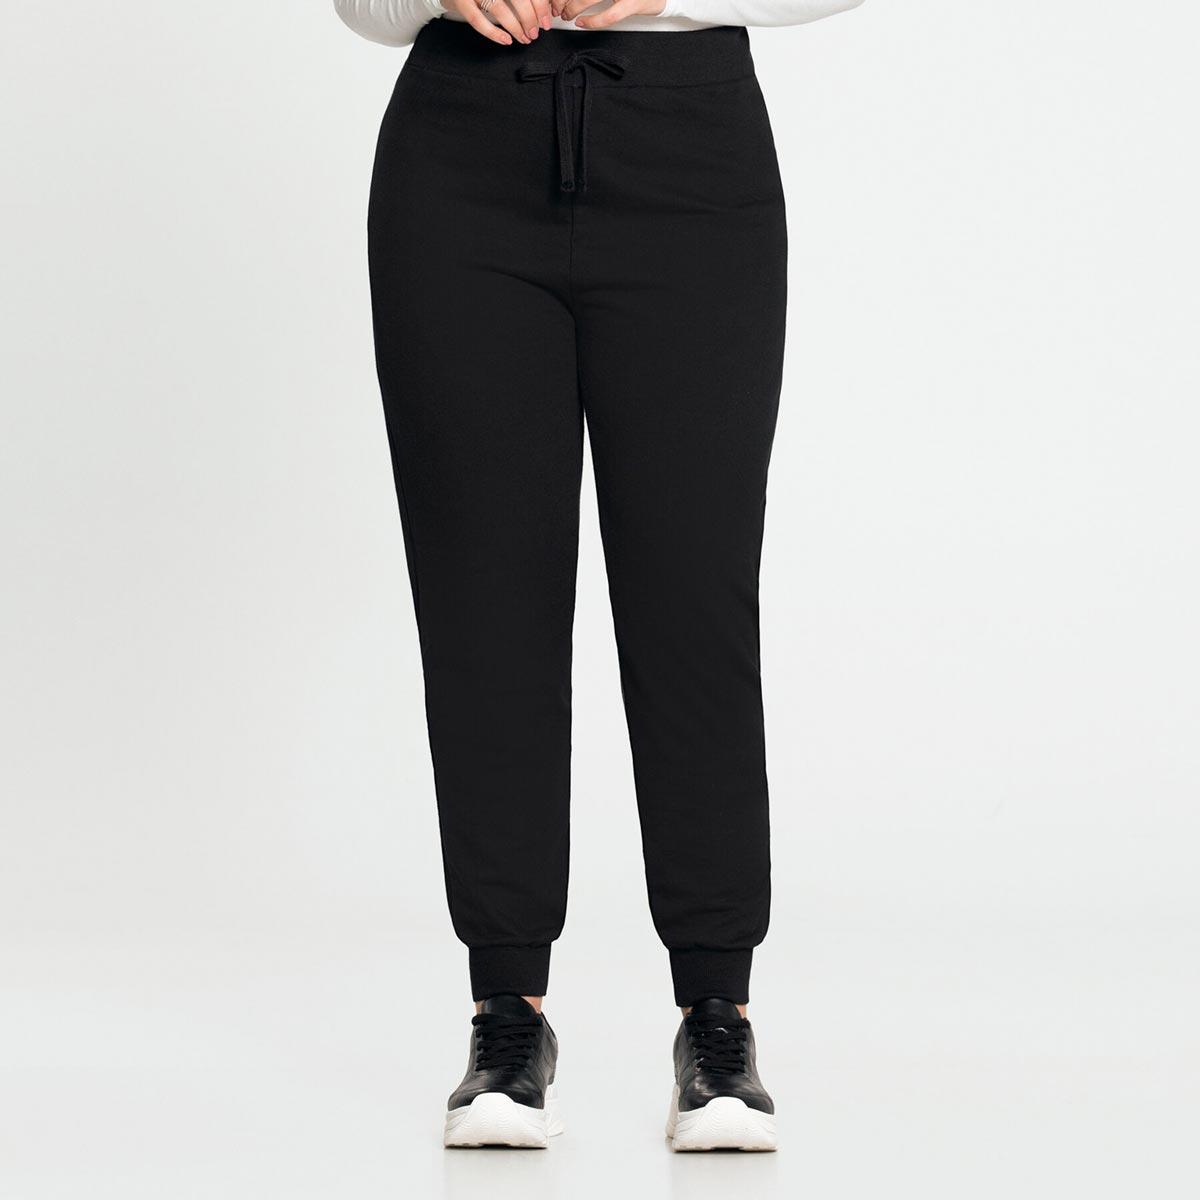 Calça Jogging Moletom Feminino Lunender Plus Size